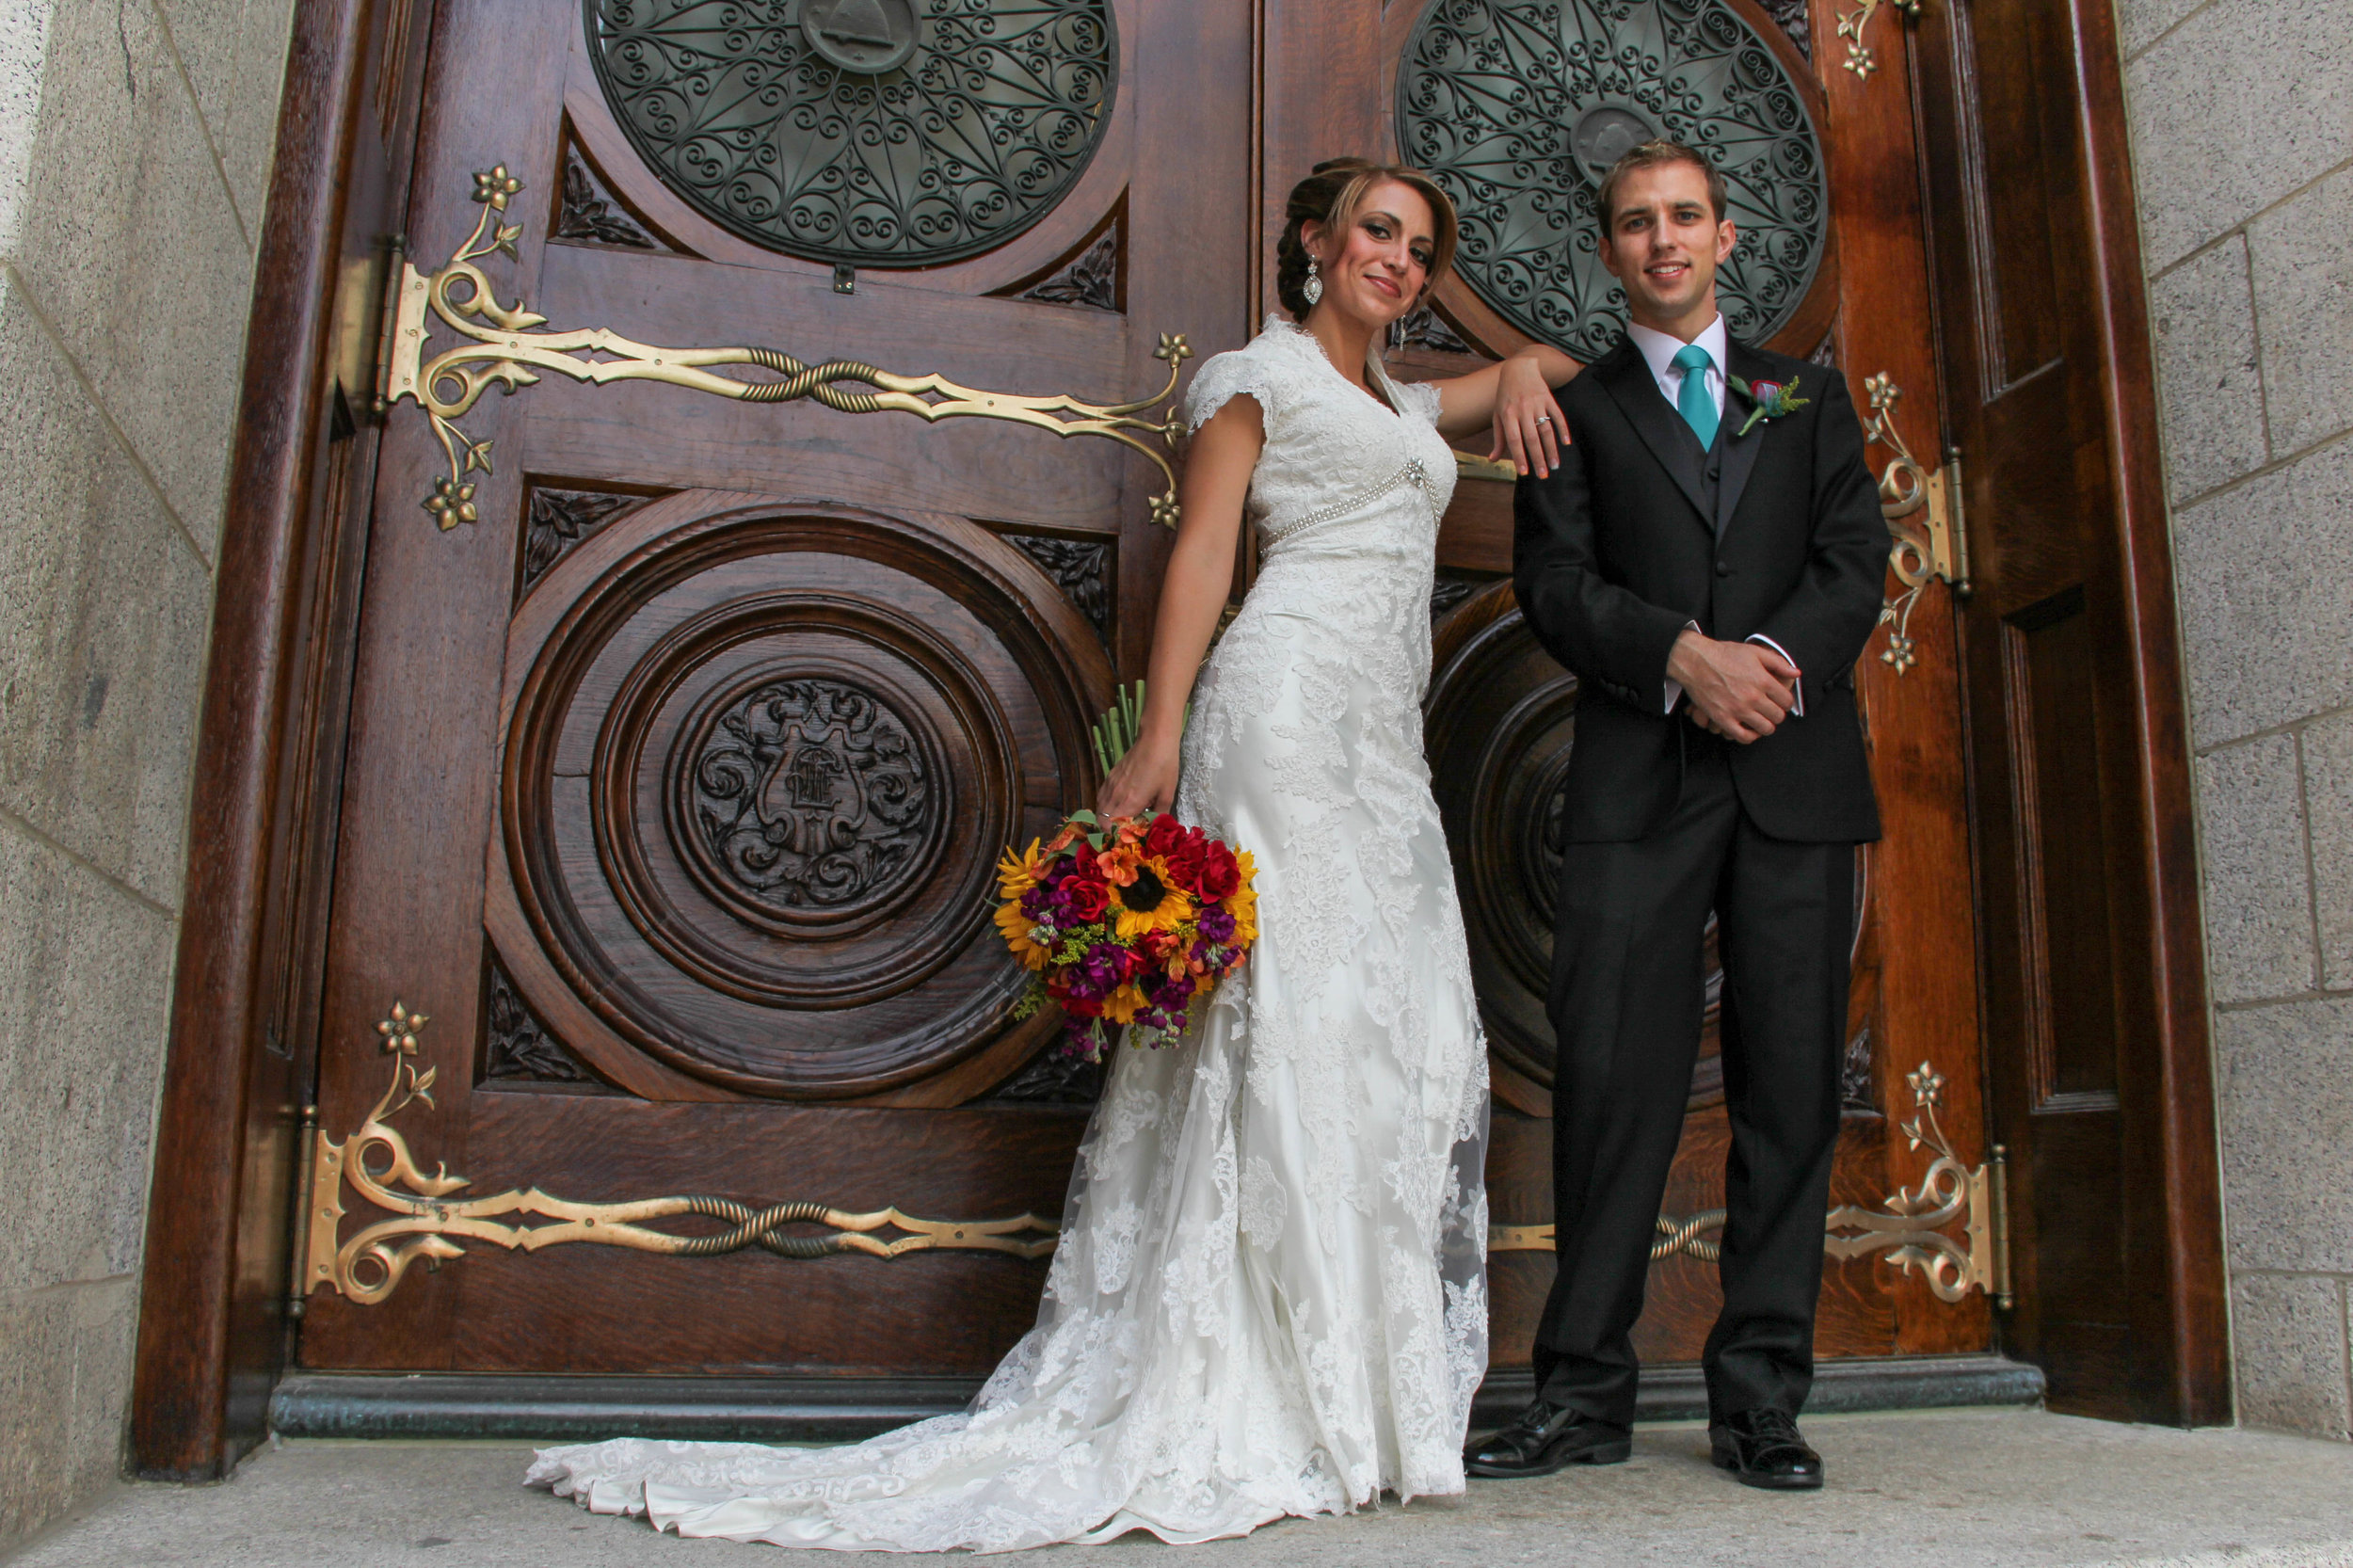 Wedding couple pose for wedding photo at the Salt Lake Temple